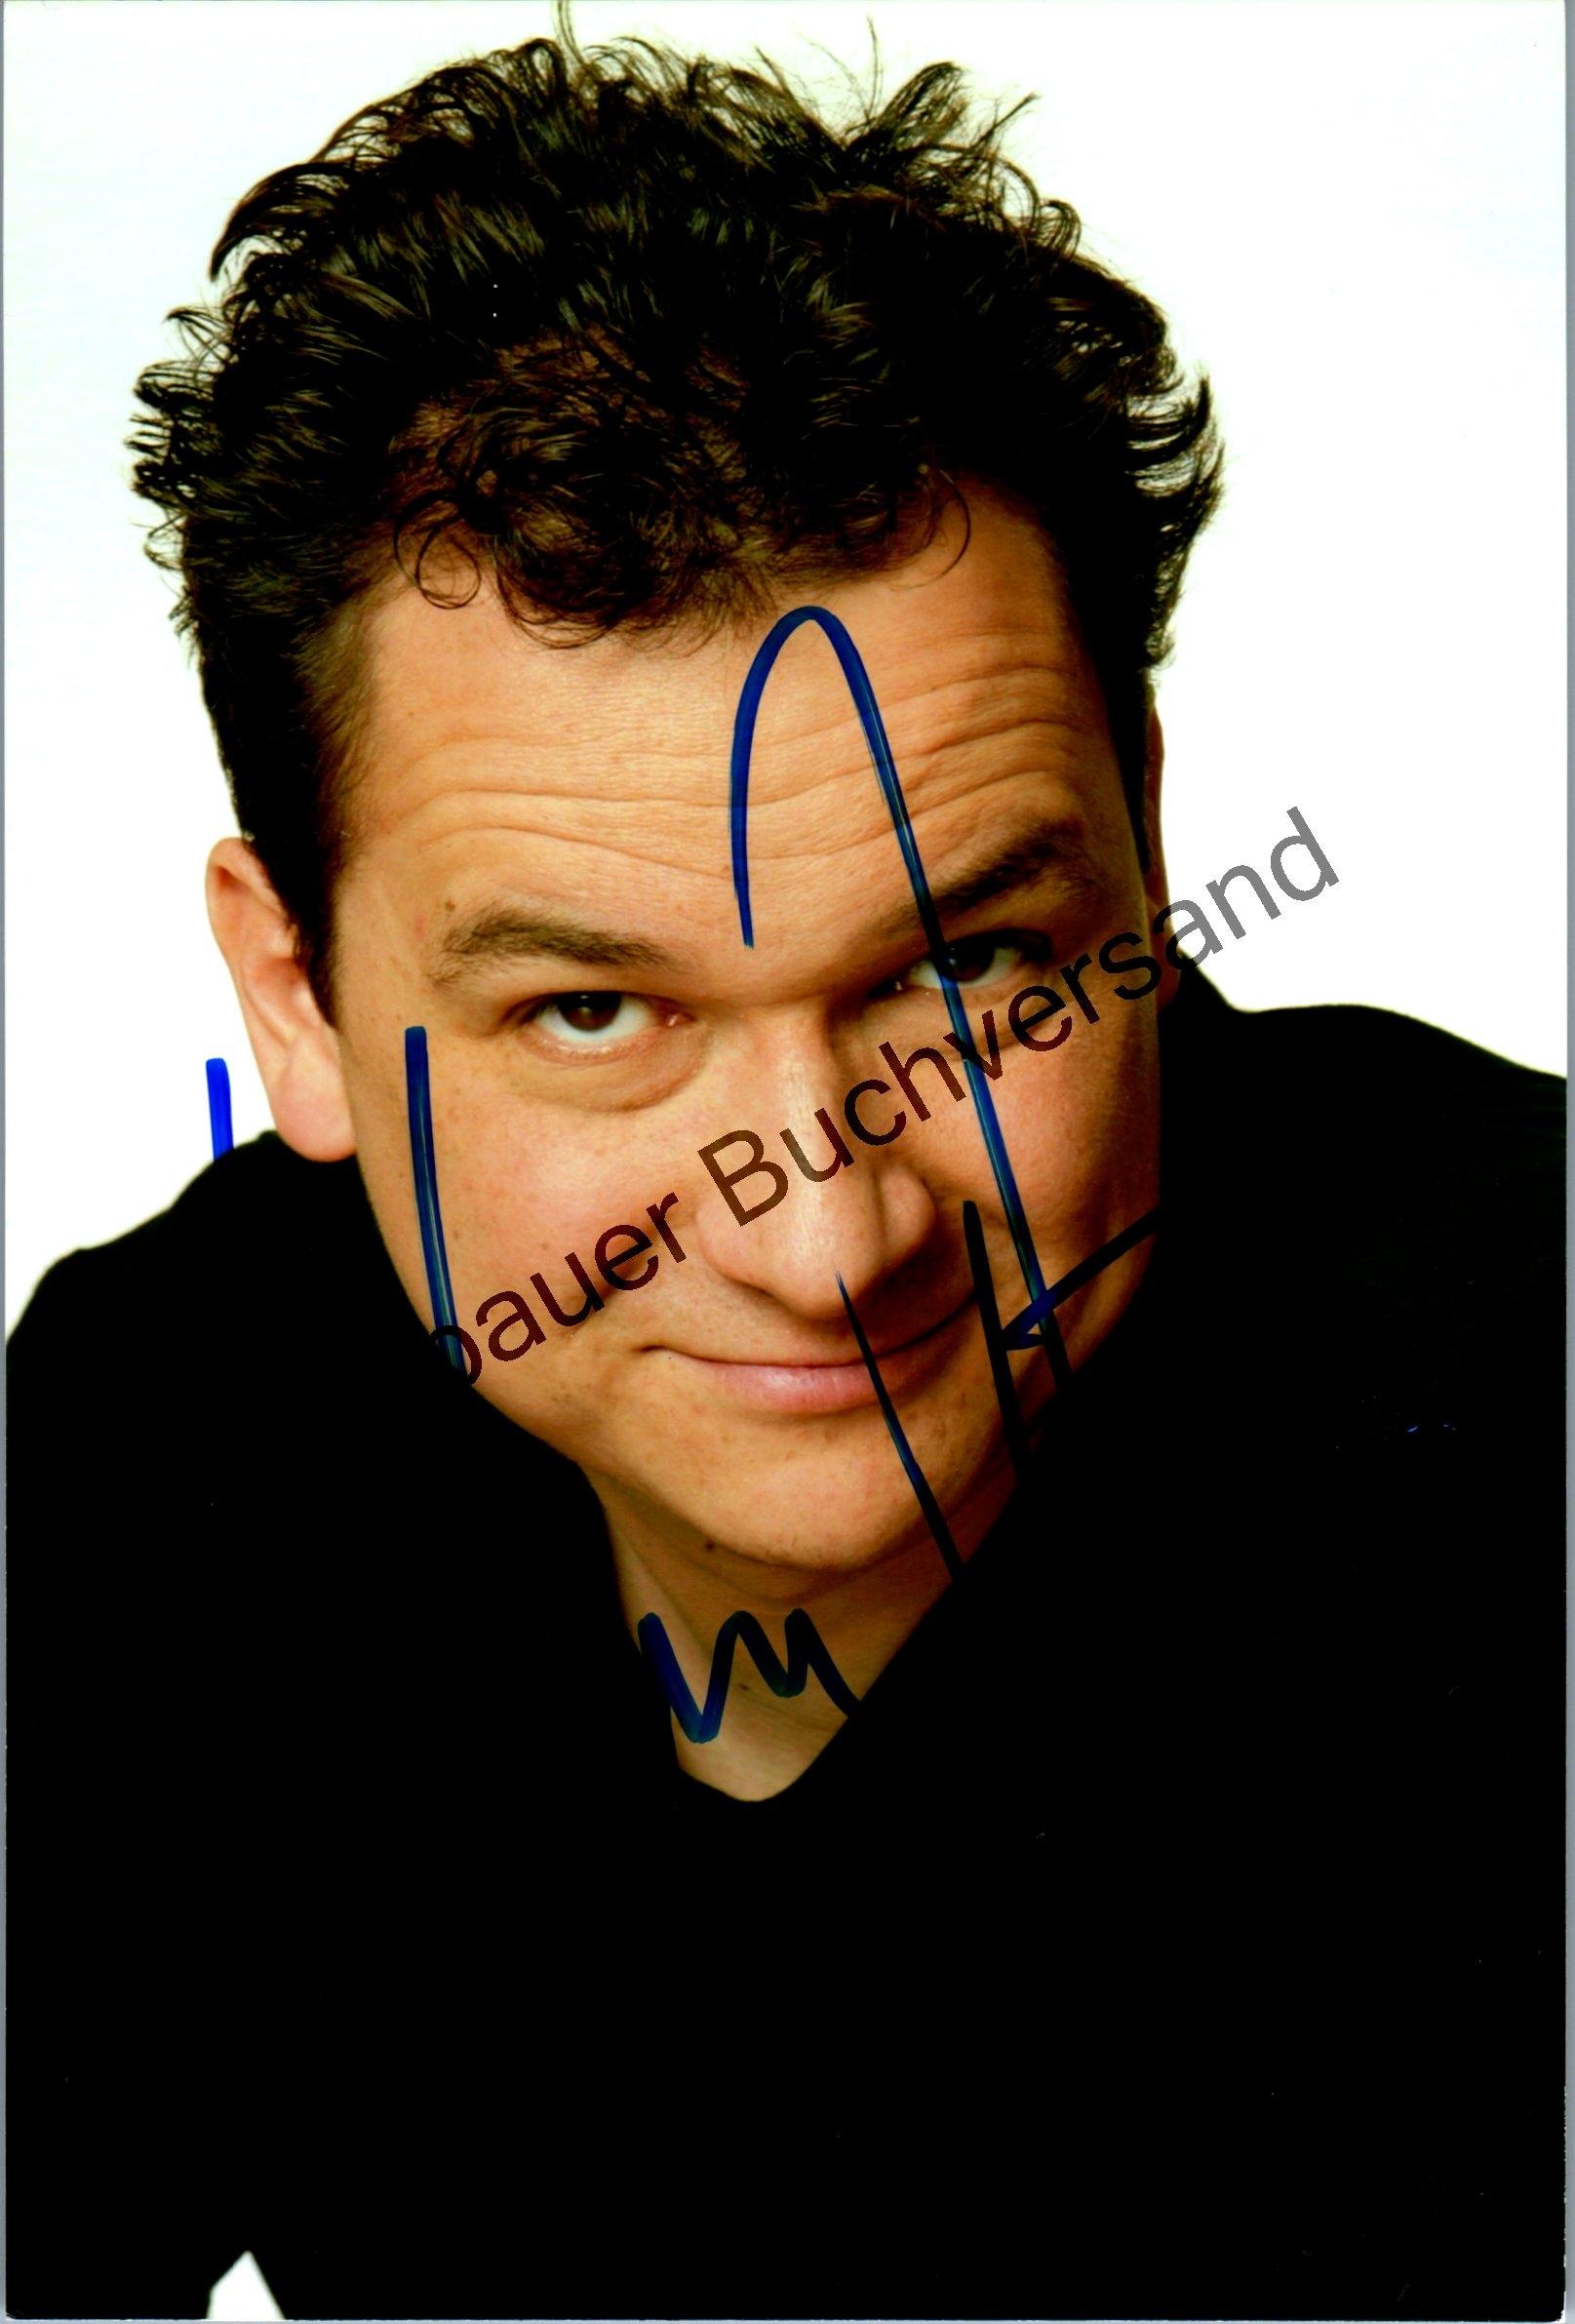 Original Autogramm Stephan Bauer /// Autogramm Autograph signiert signed signee